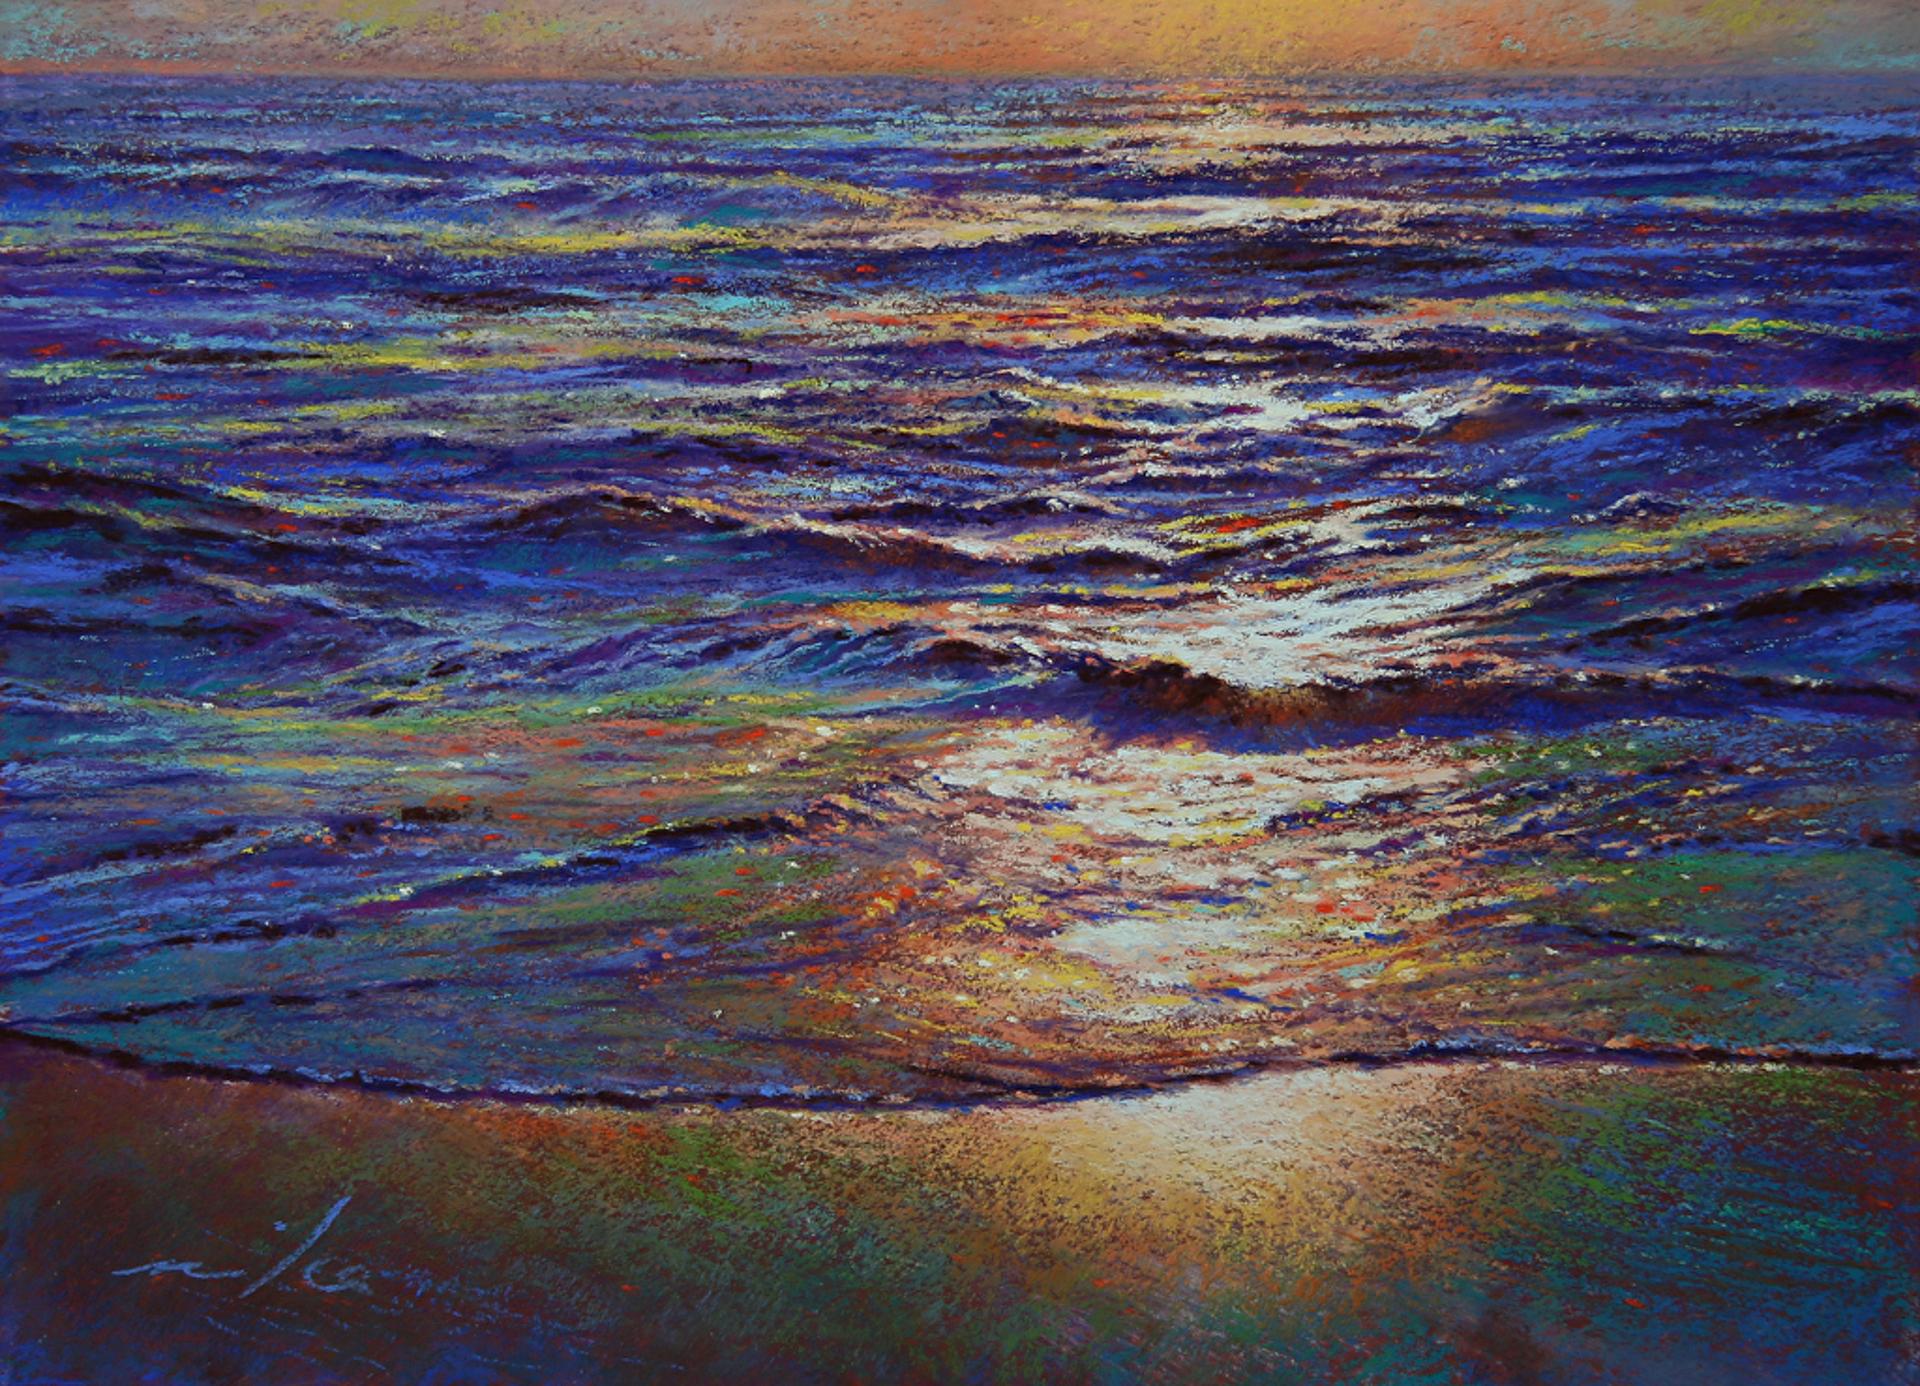 Turbulent Times by Mike Barret Kolasinski